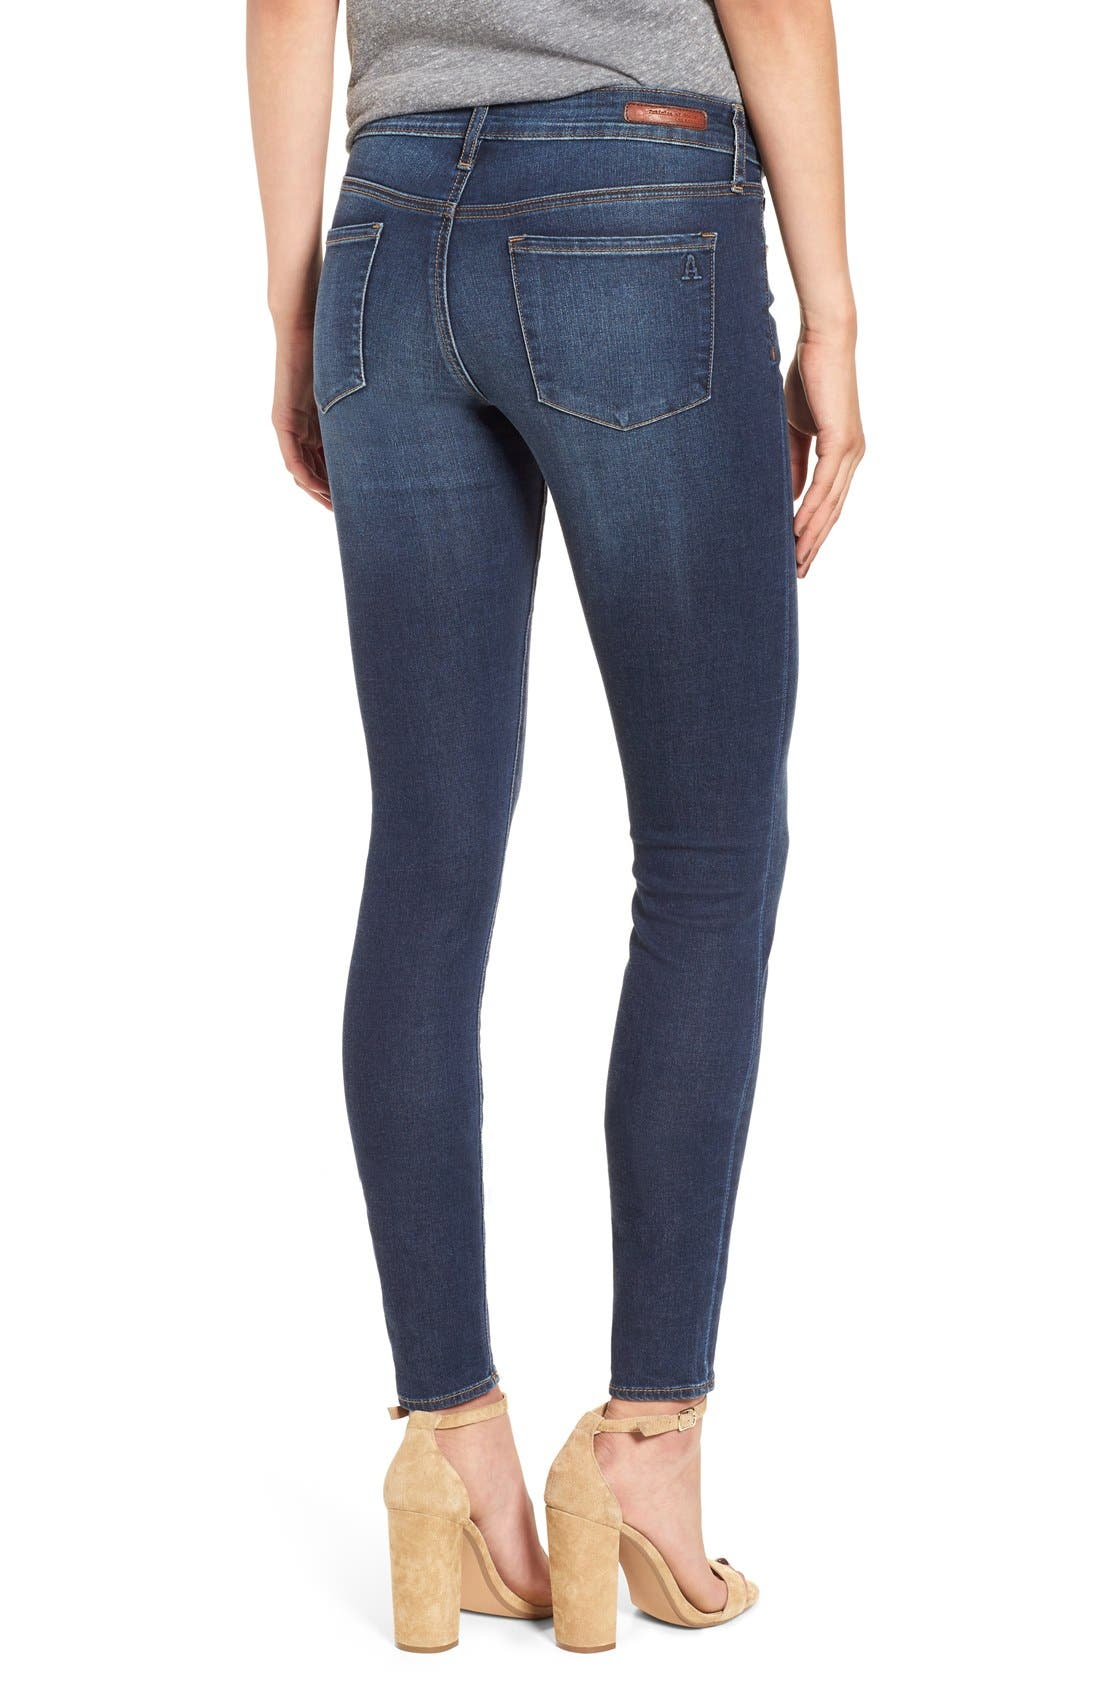 Alternate Image 2  - Articles of Society 'Mya' Skinny Jeans (Glendale)